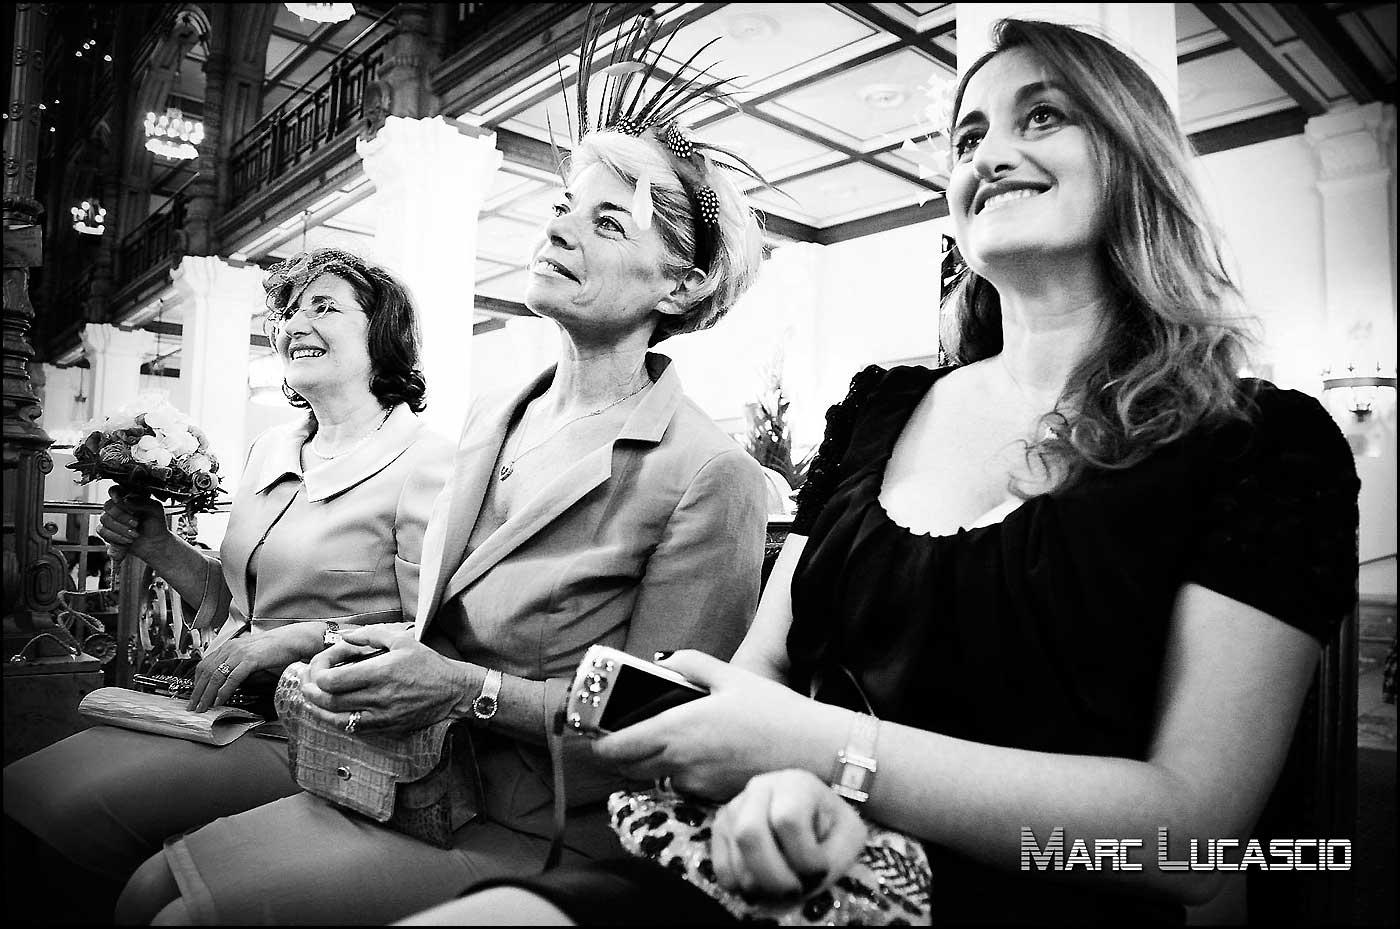 femmes du mariage juif